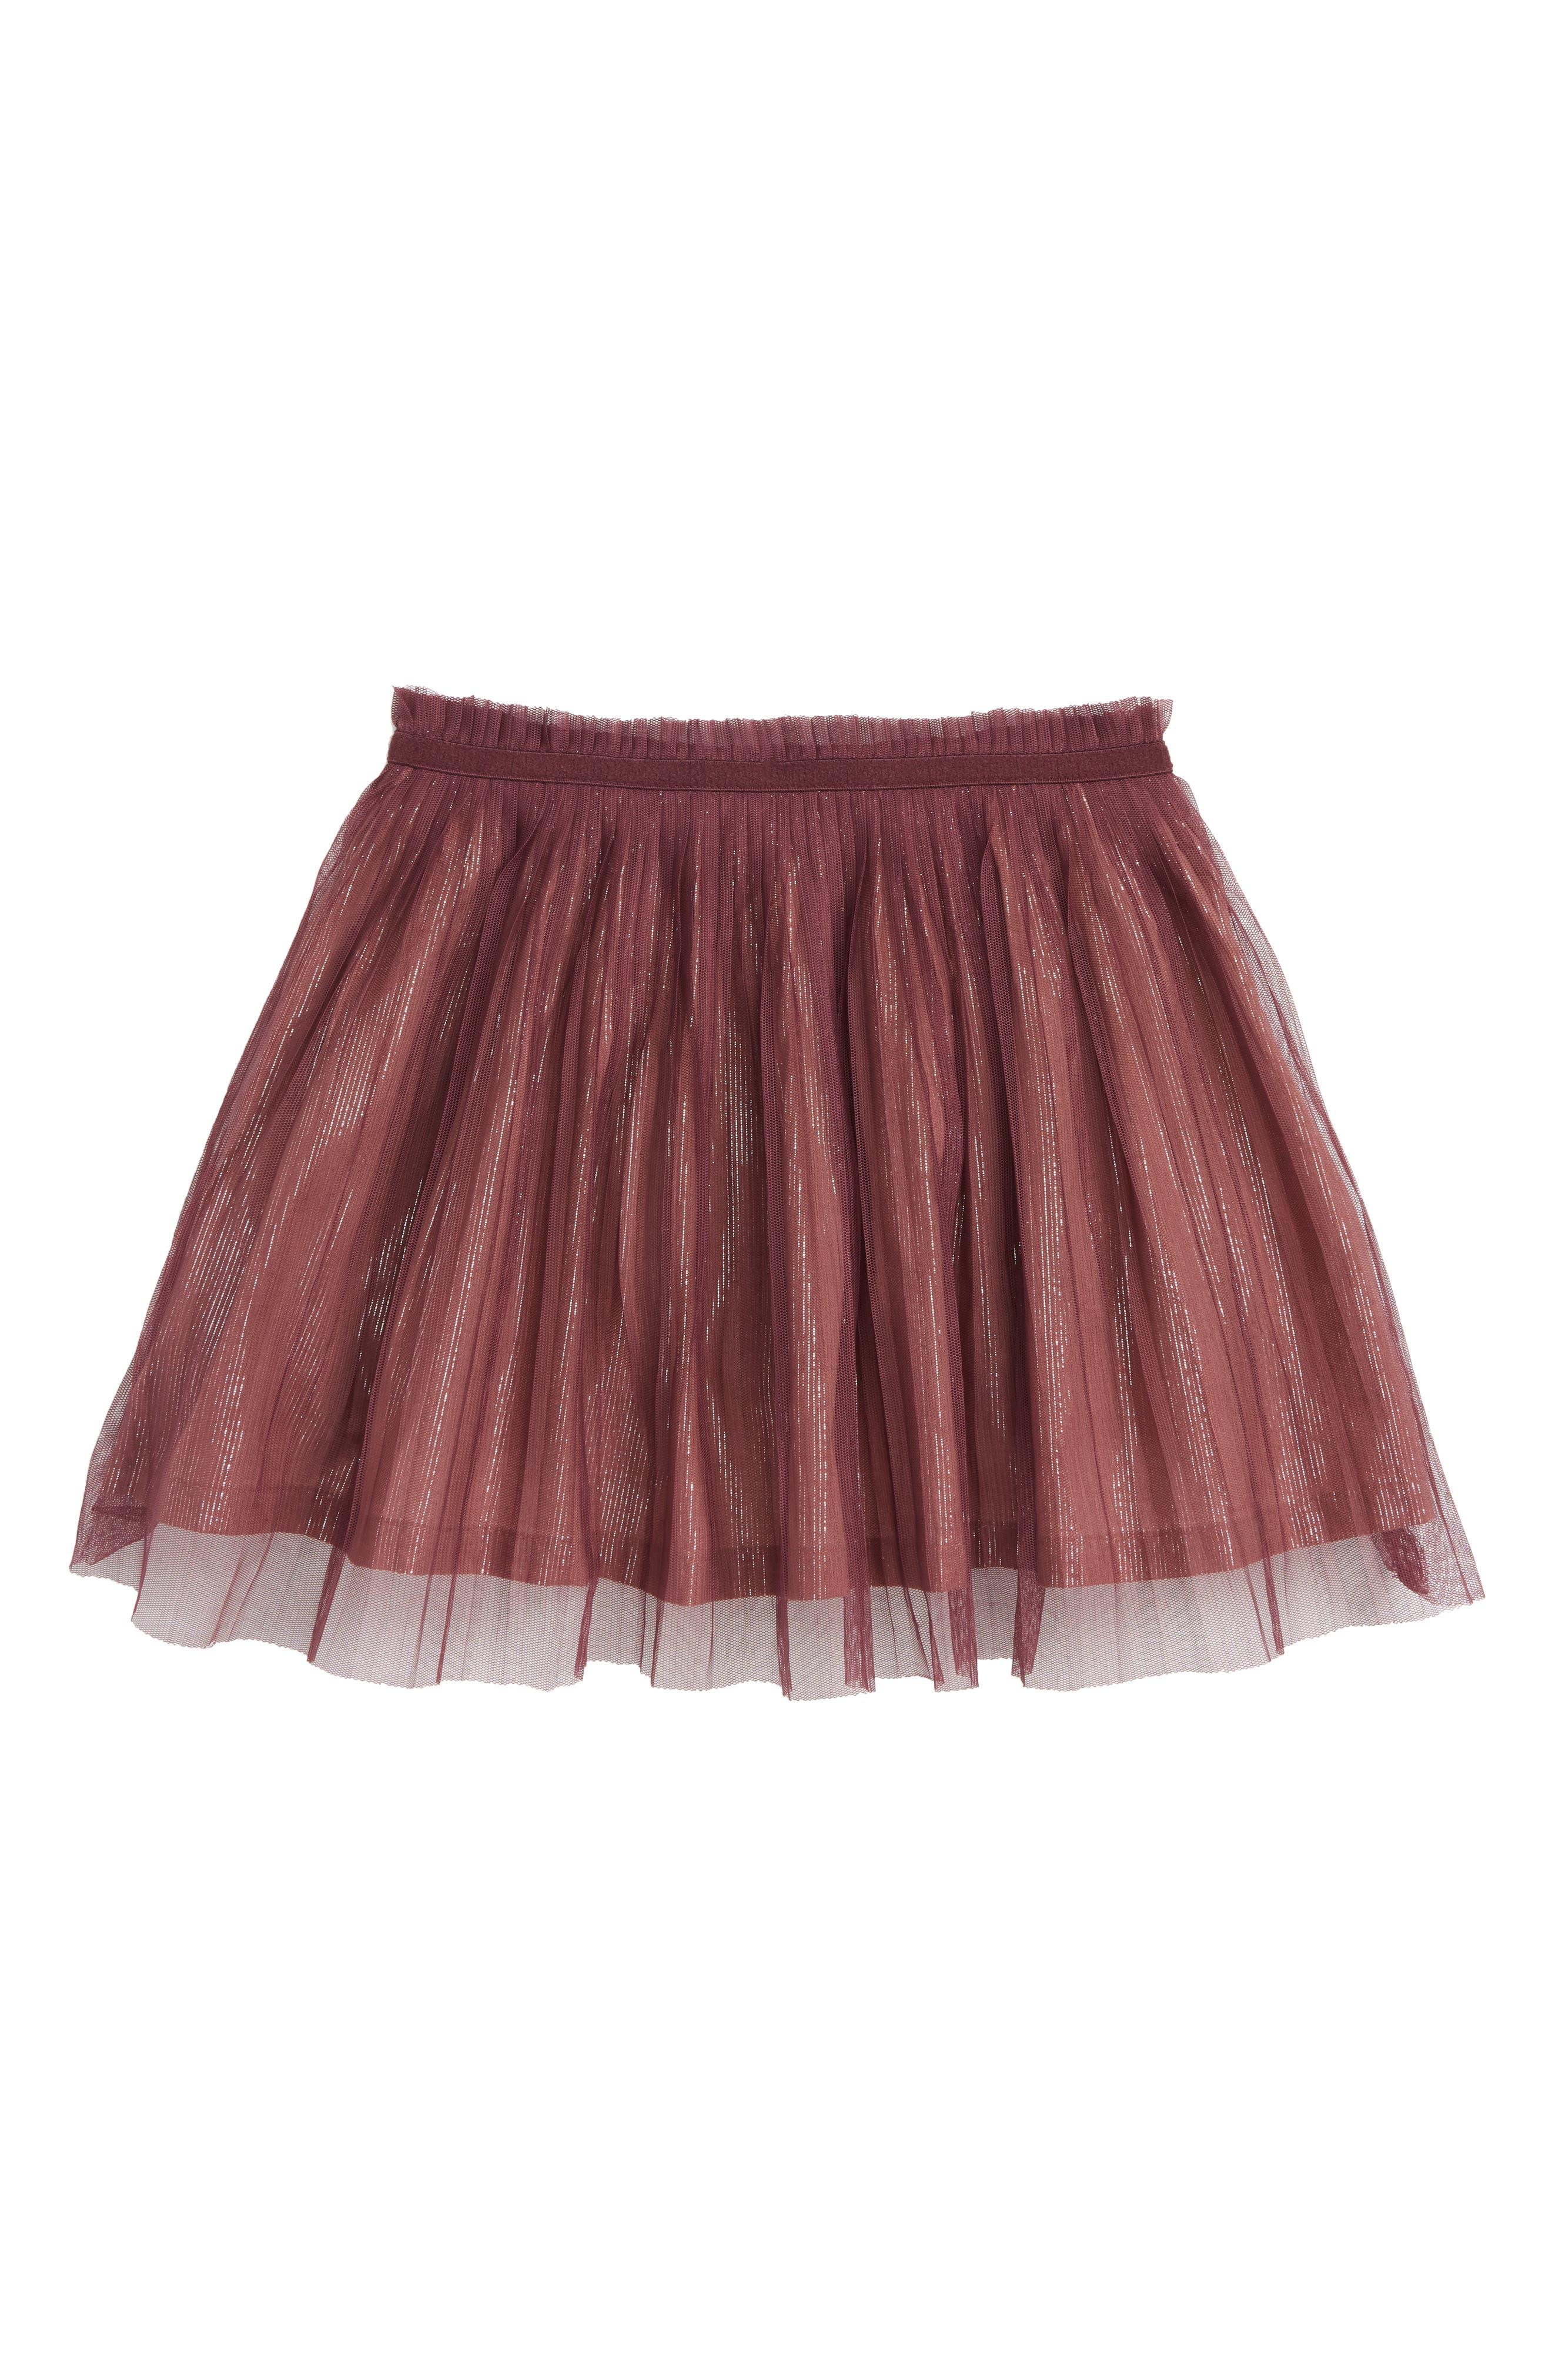 Dana Skirt,                         Main,                         color, 020